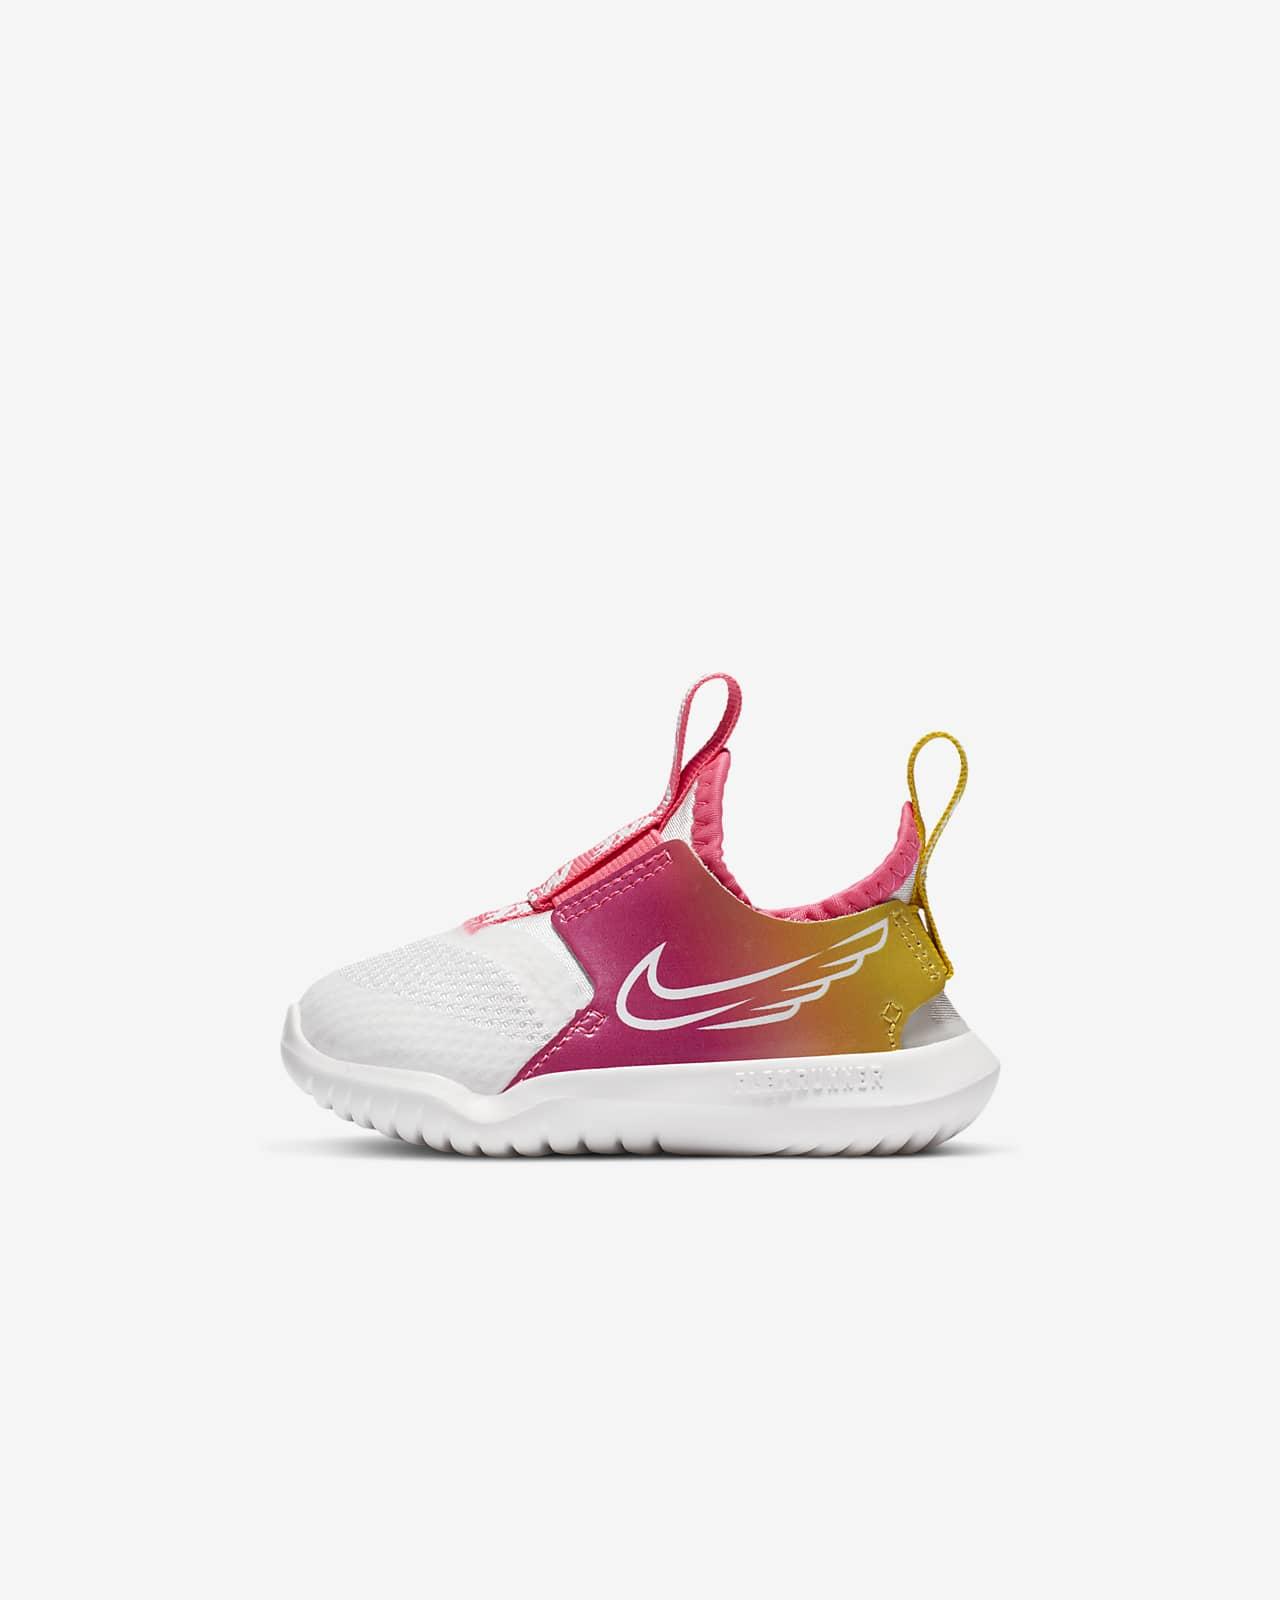 Nike Flex Runner Sun 嬰幼兒鞋款